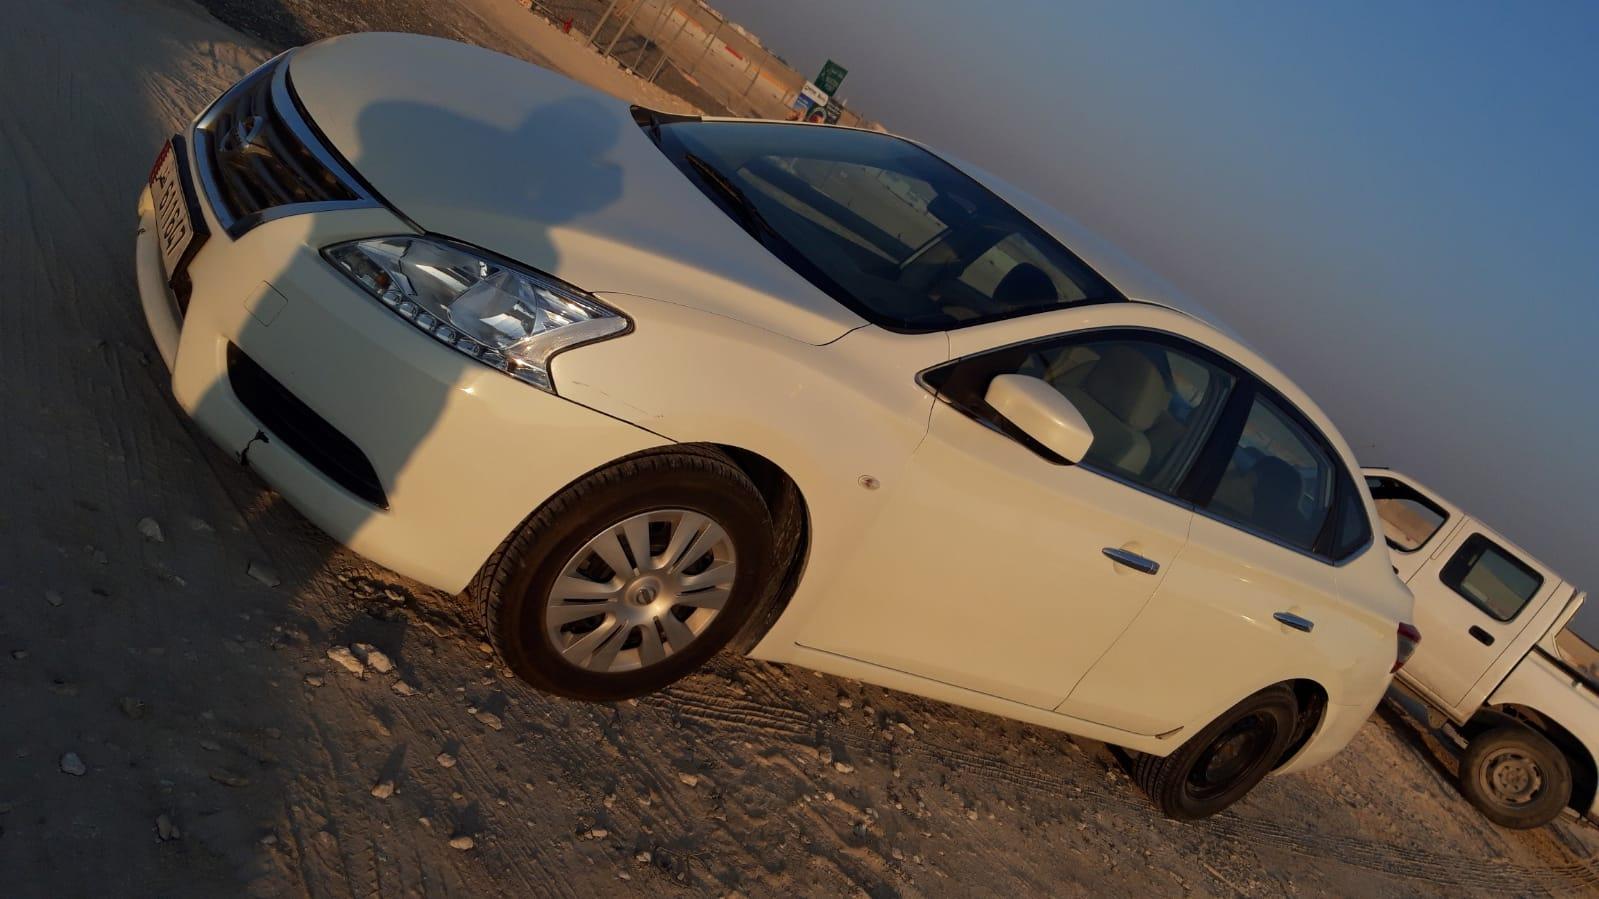 Nissan Sentra for sale @13500 QAR